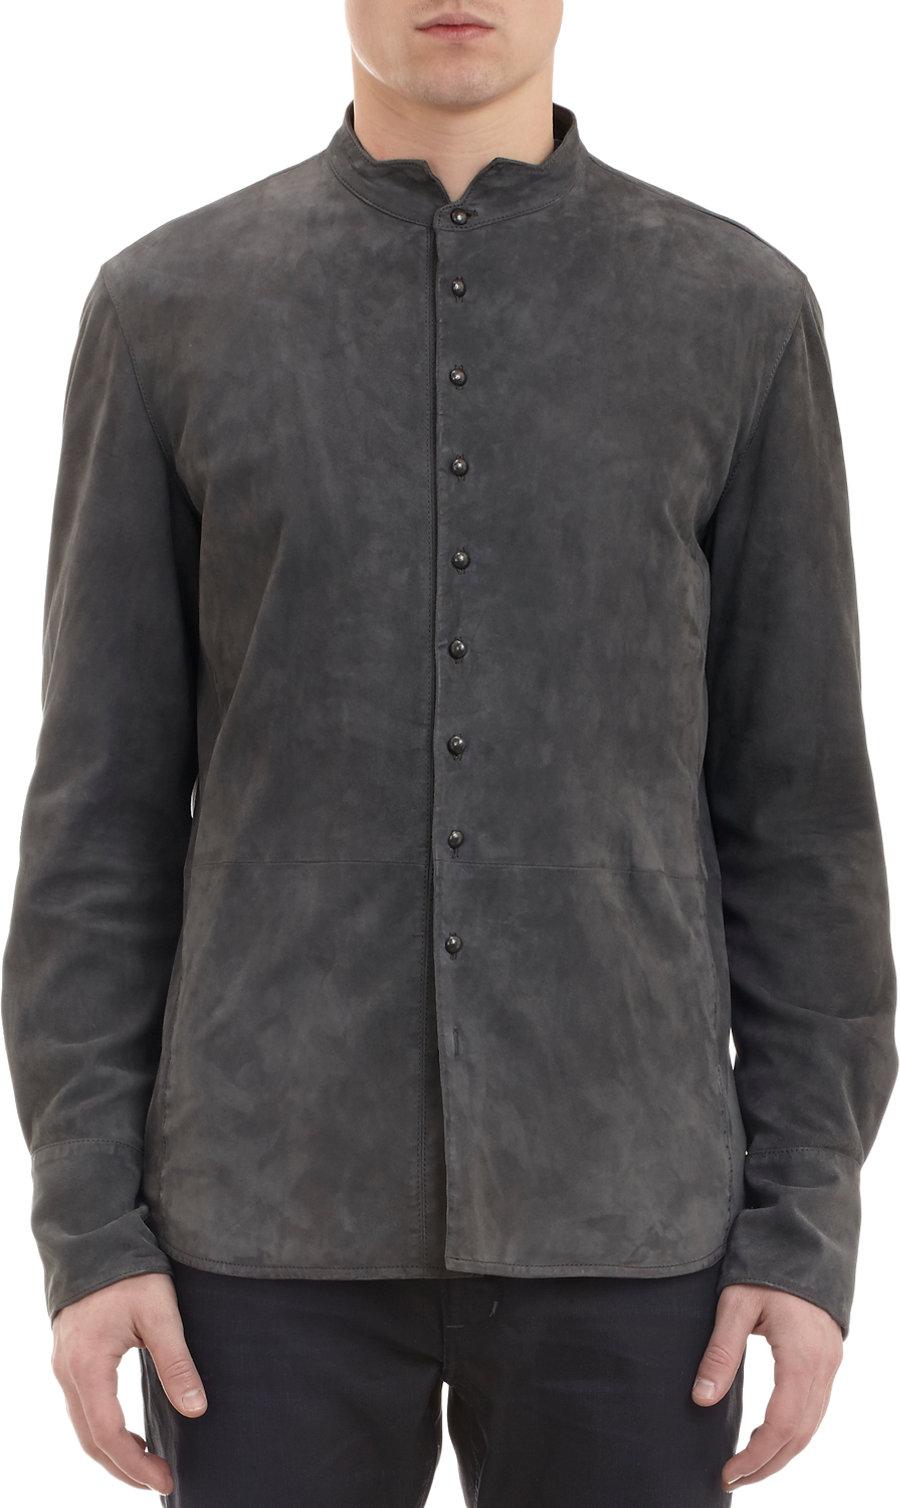 john varvatos suede shirt jacket in gray for men grey lyst